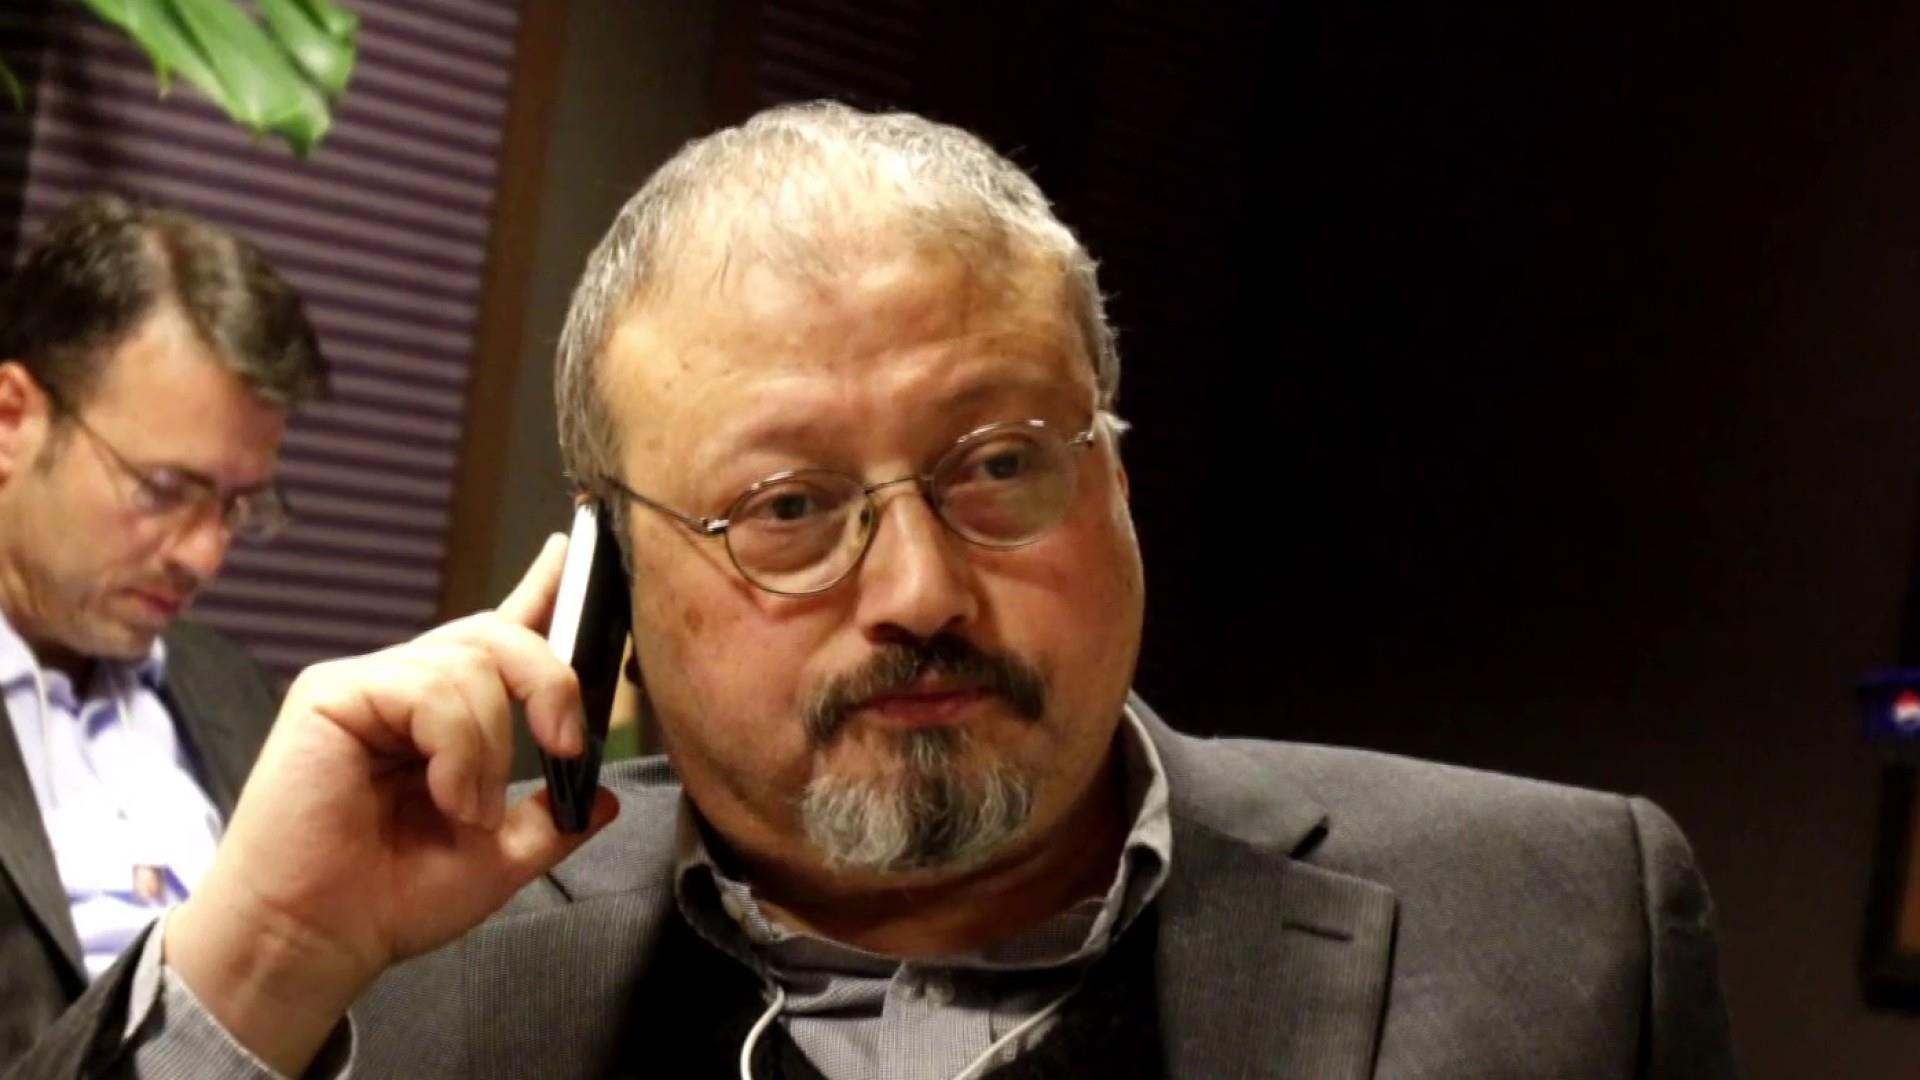 Fmr. Amb: reported Trump 'devil's bargain' after Khashoggi killing 'horrendous'